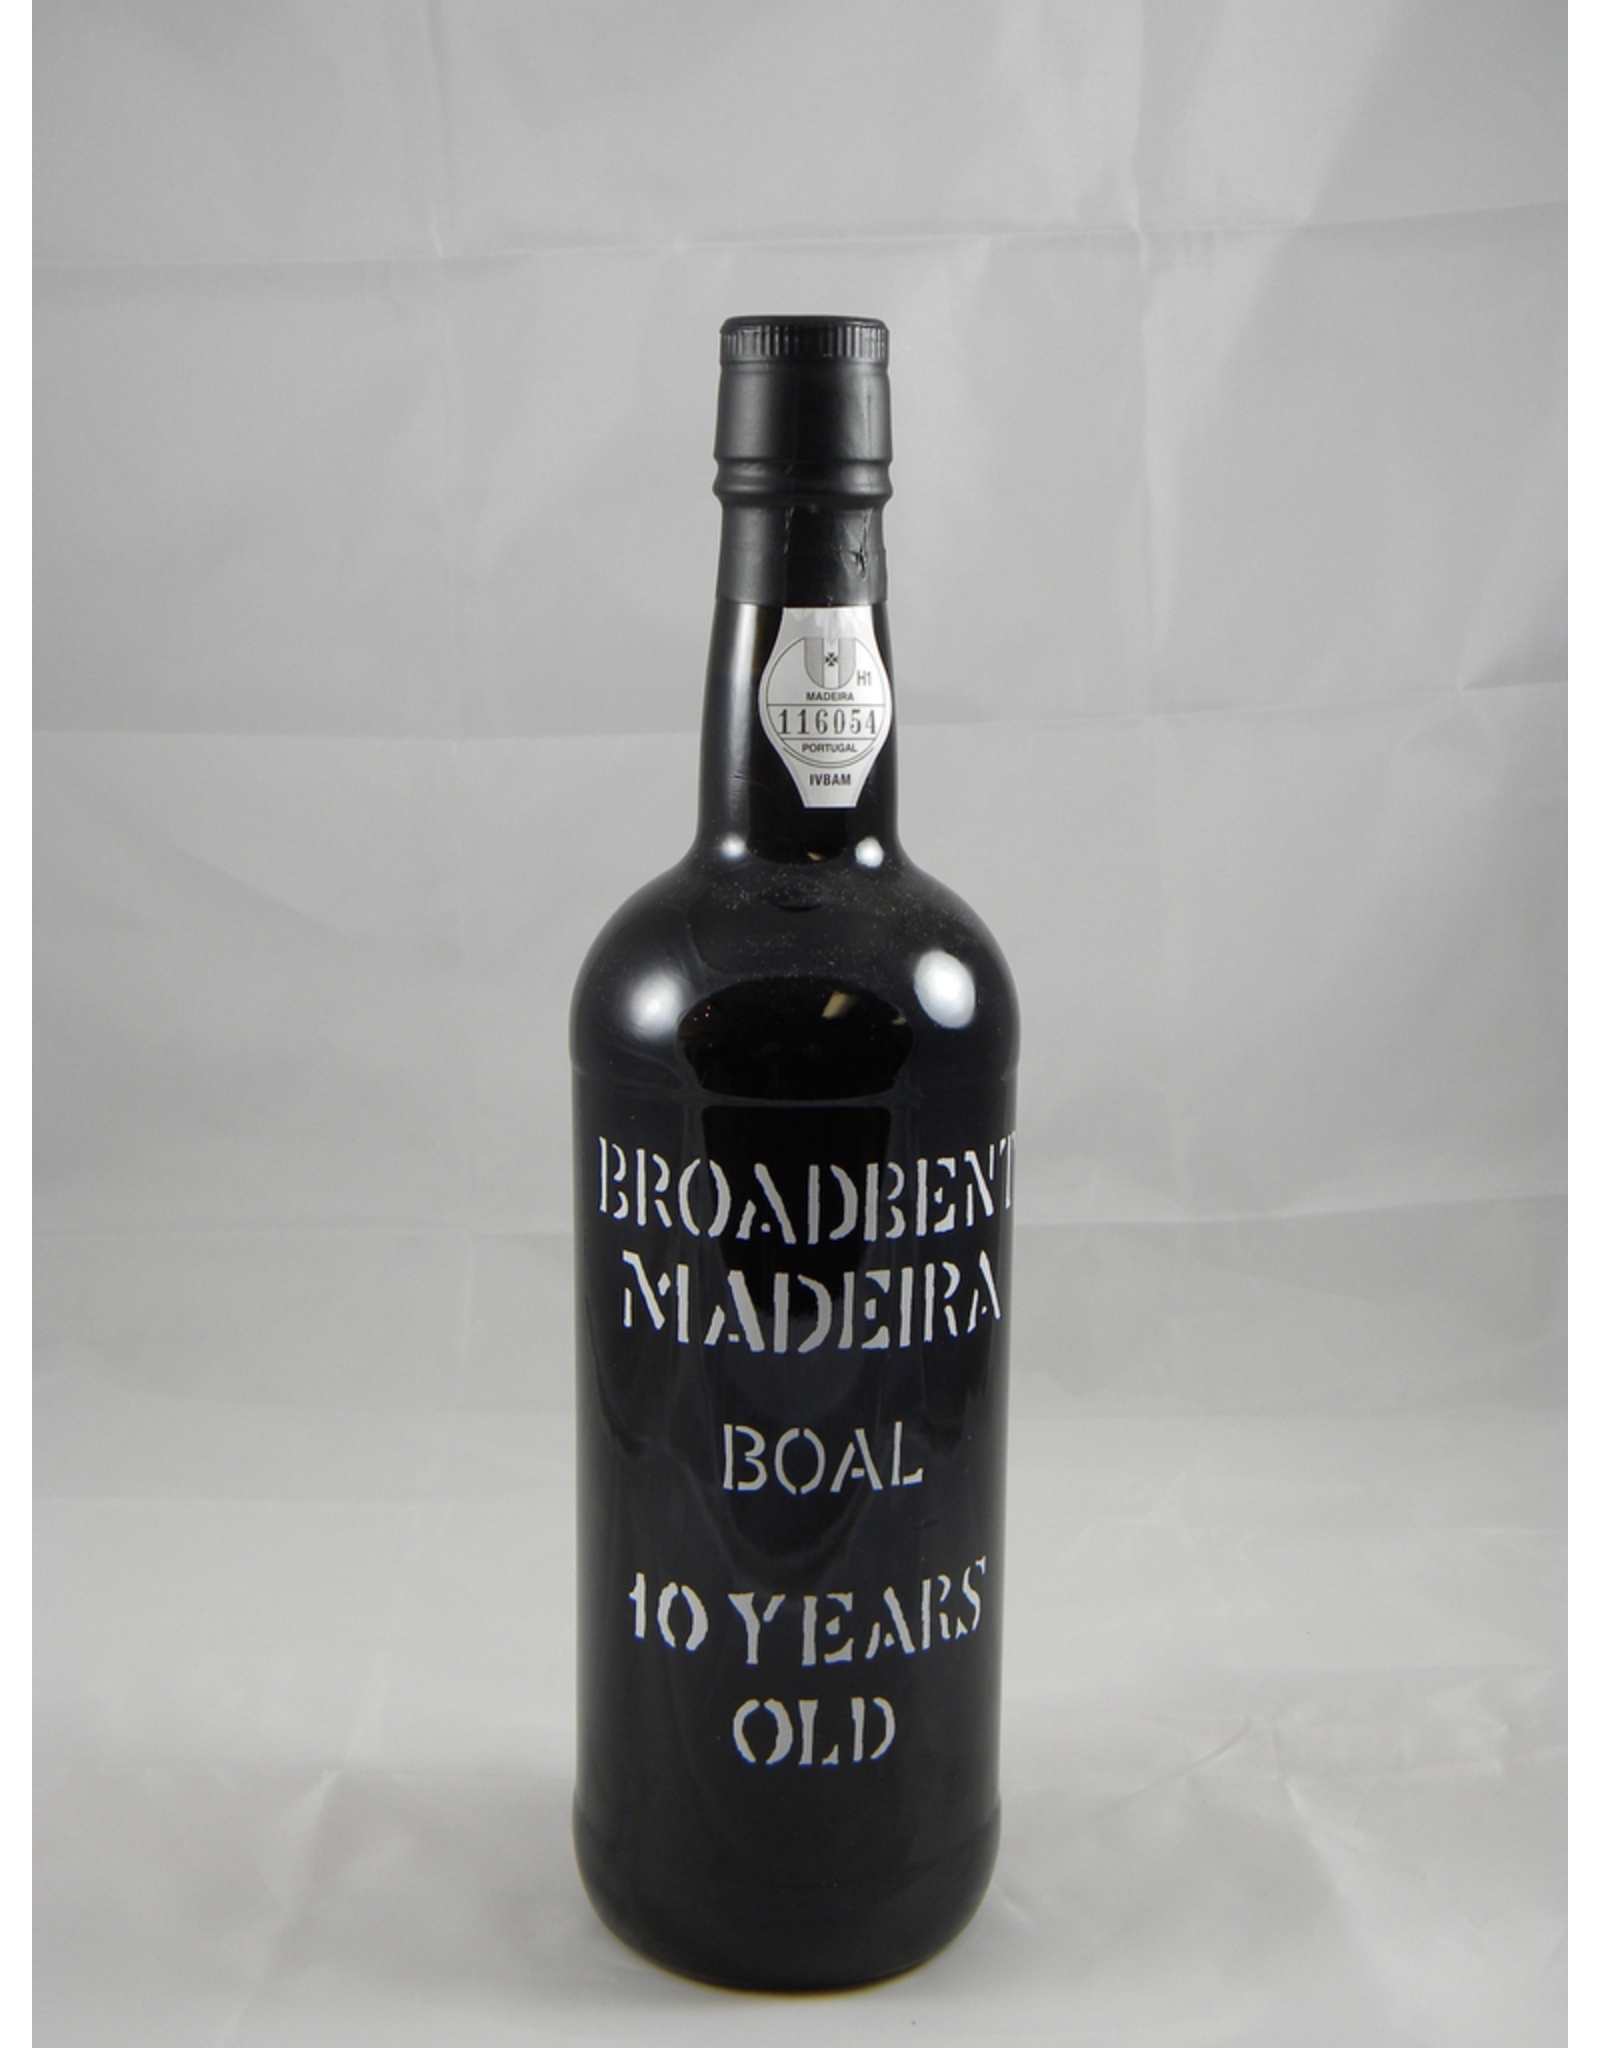 Broadbent Broadbent Madeira Boal 10 Year